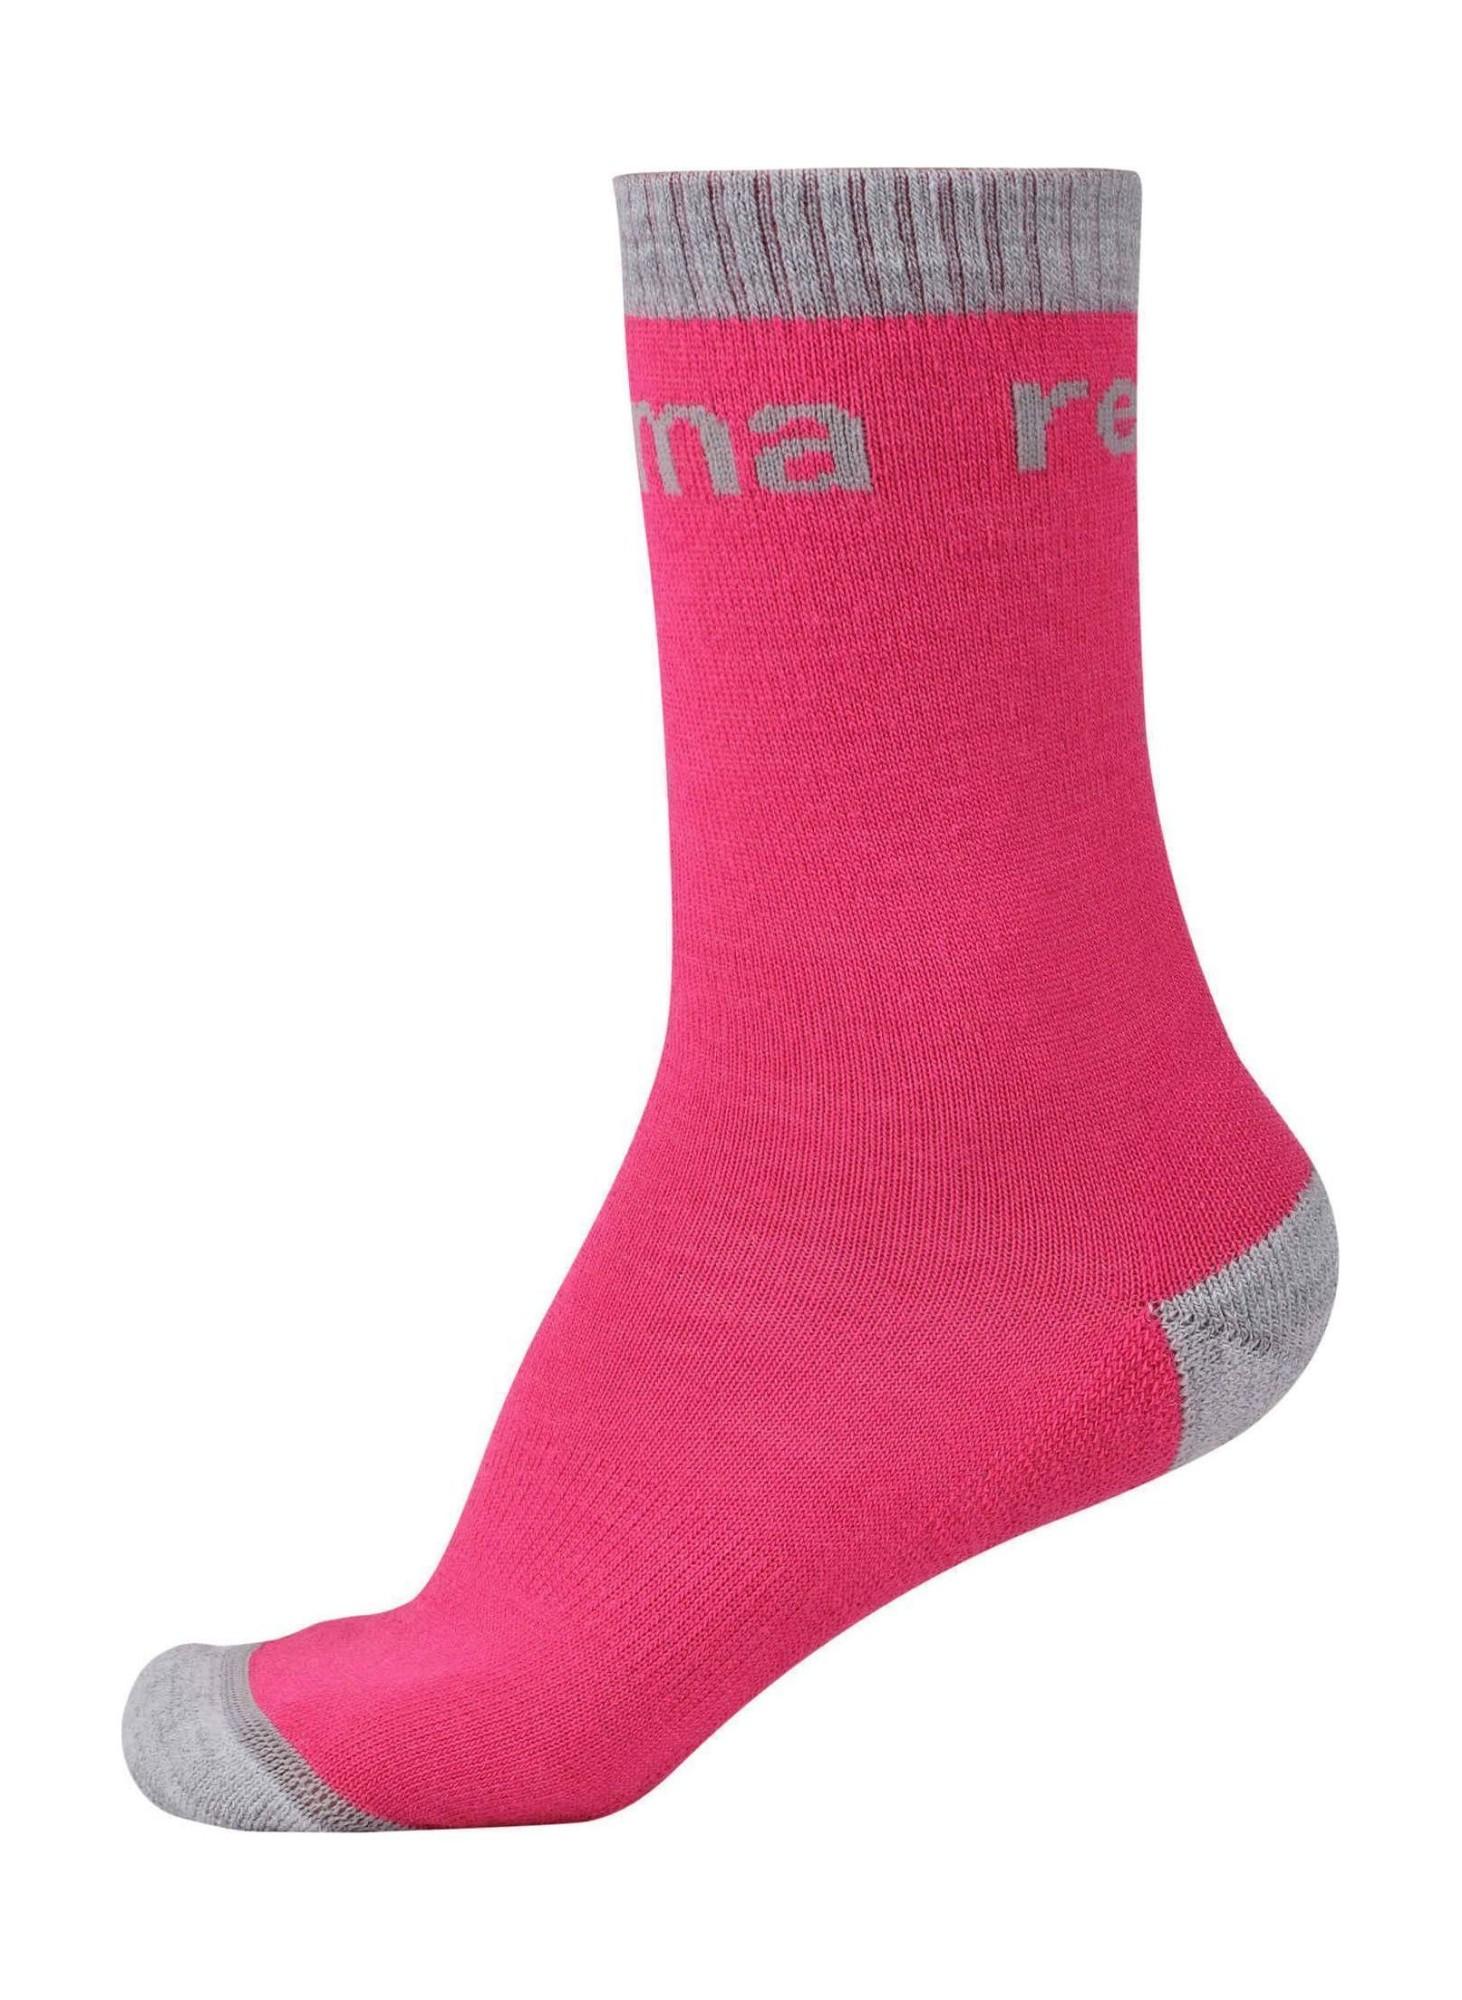 REIMA Boot Raspberry Pink 34-37